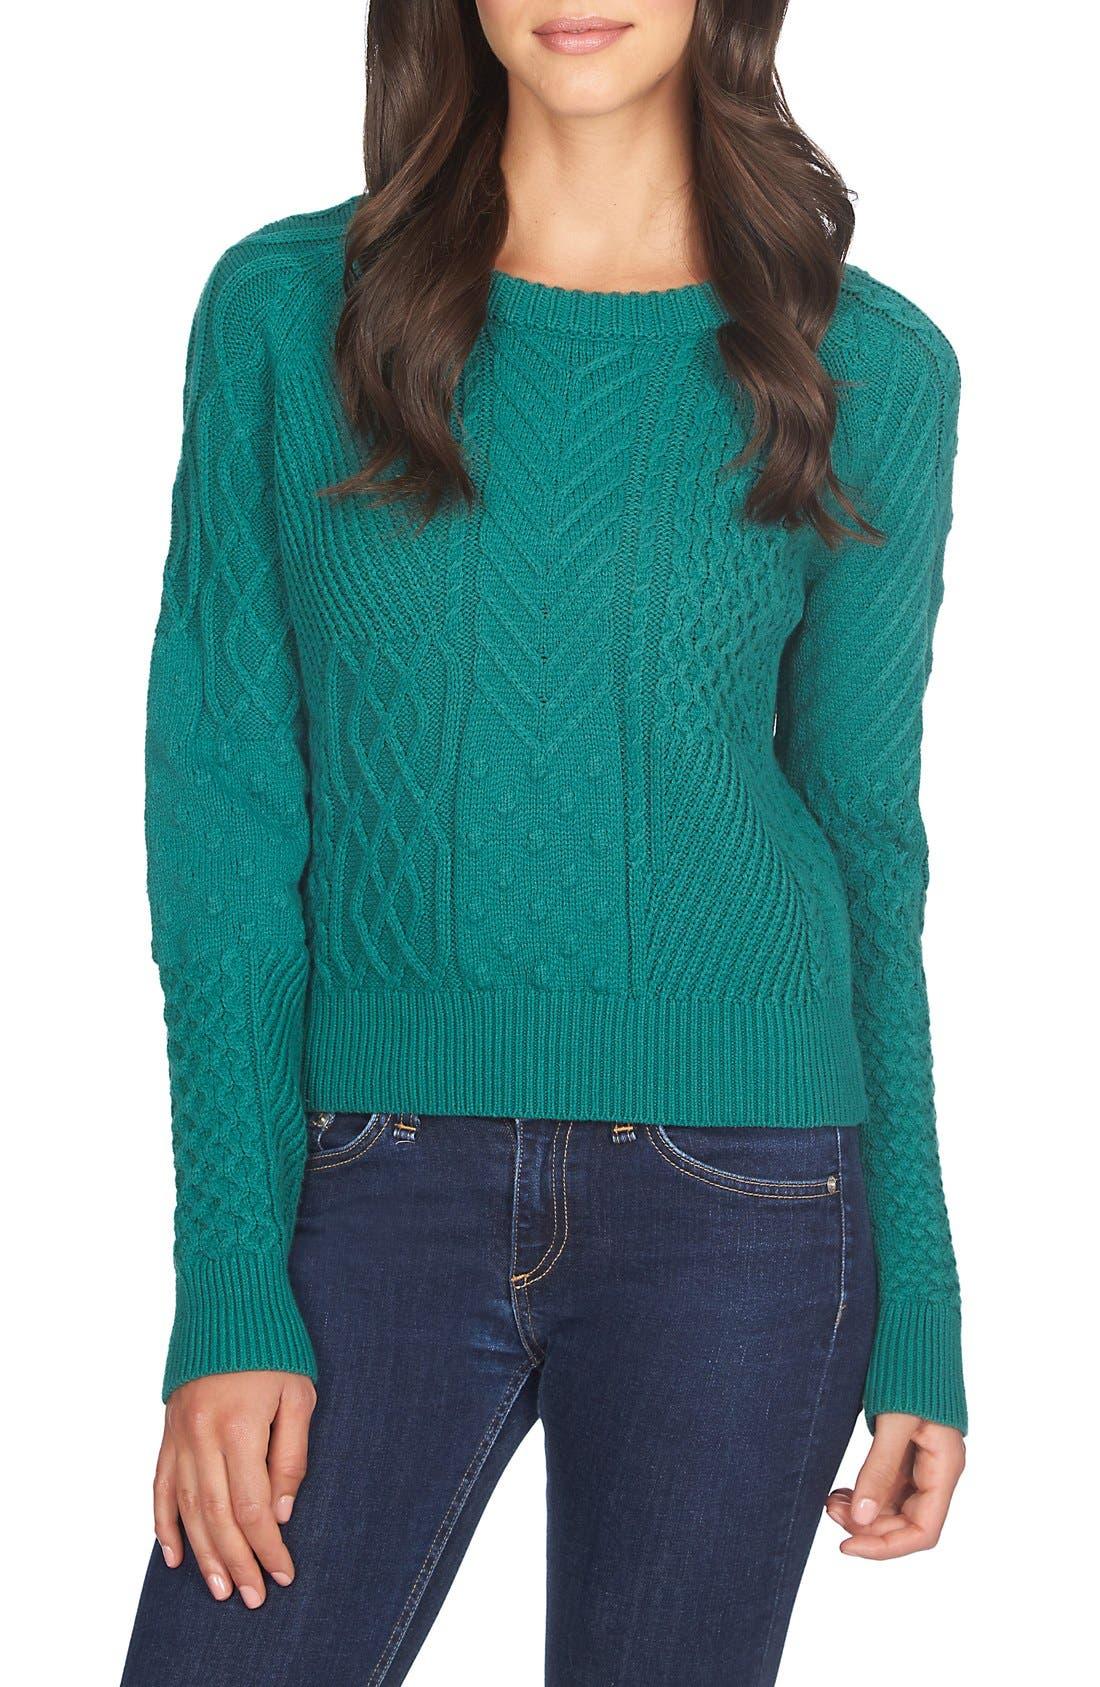 Alternate Image 1 Selected - 1.STATE CrewneckKnit Sweater